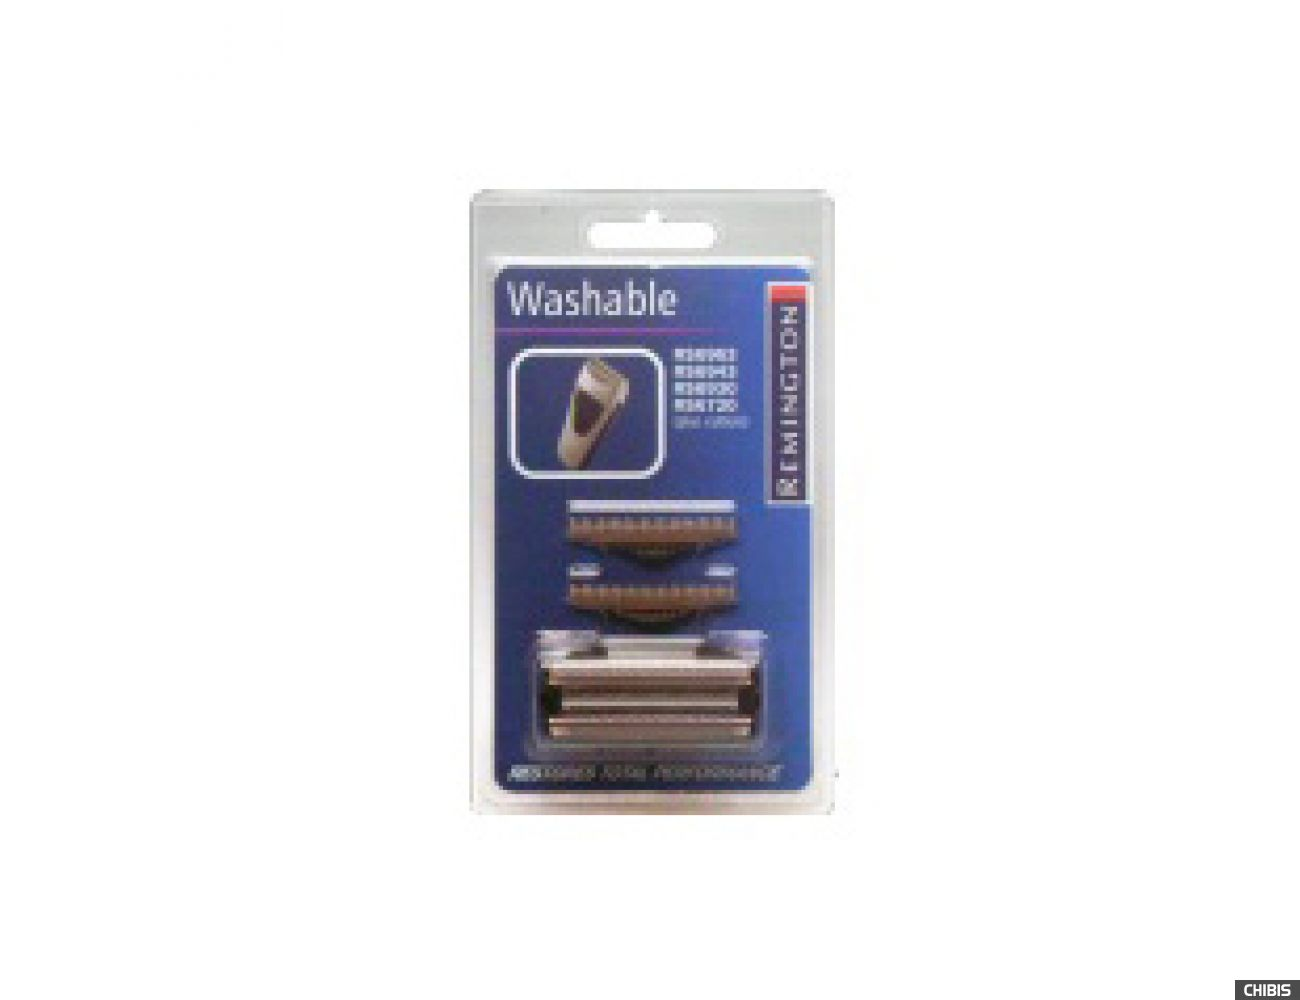 Сетка и режущий блок Remington SP282 Washable (44028530400) для RS6963, RS6943, RS6930, RS6720